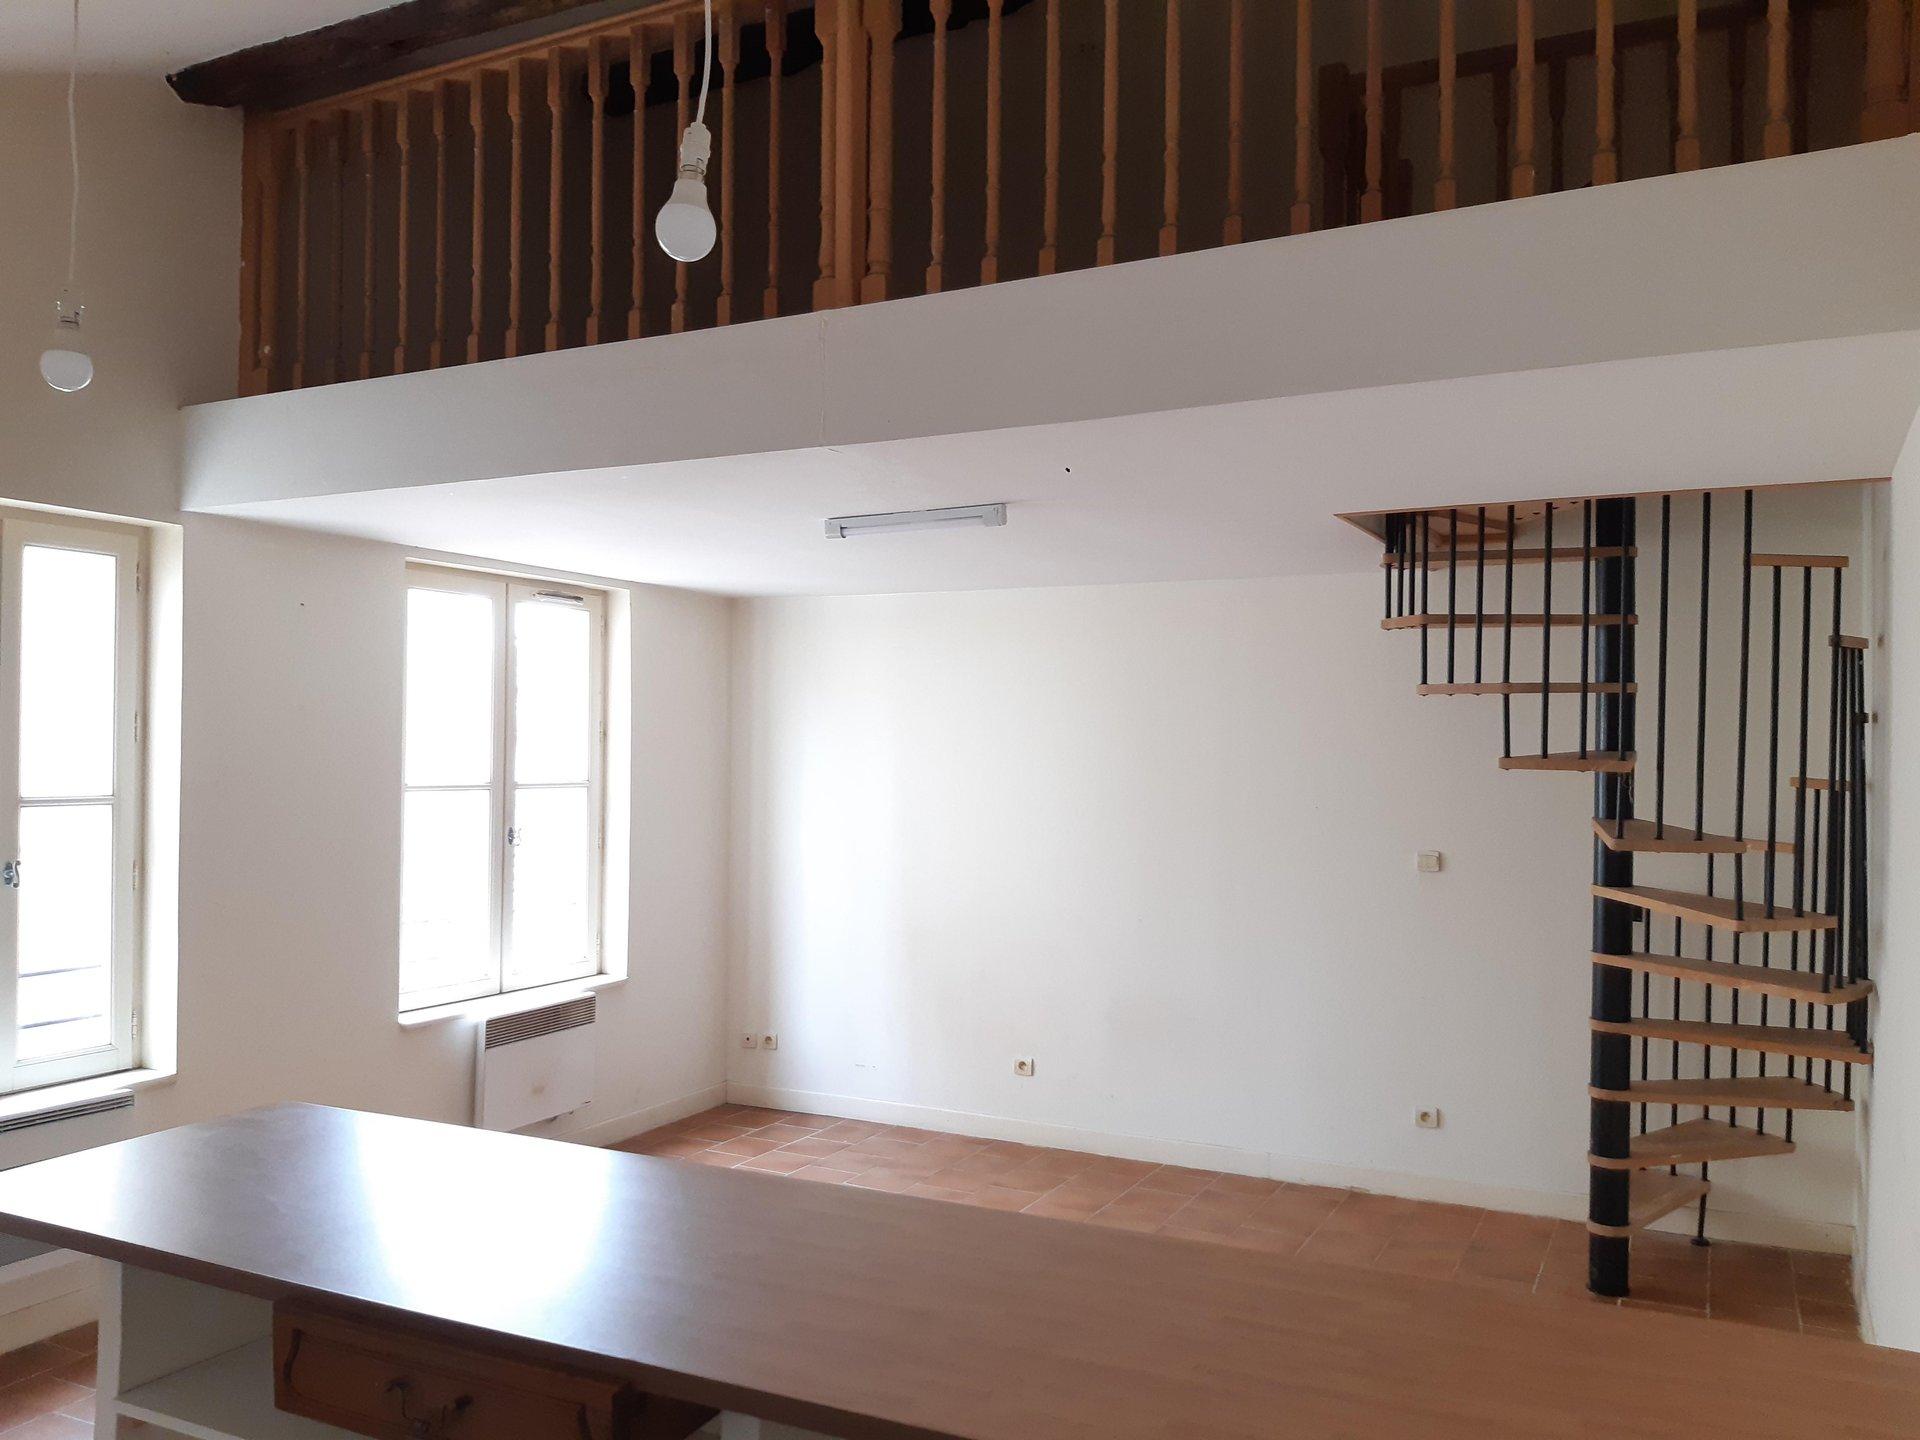 Location Appartement BEAUCAIRE Mandat : 0405